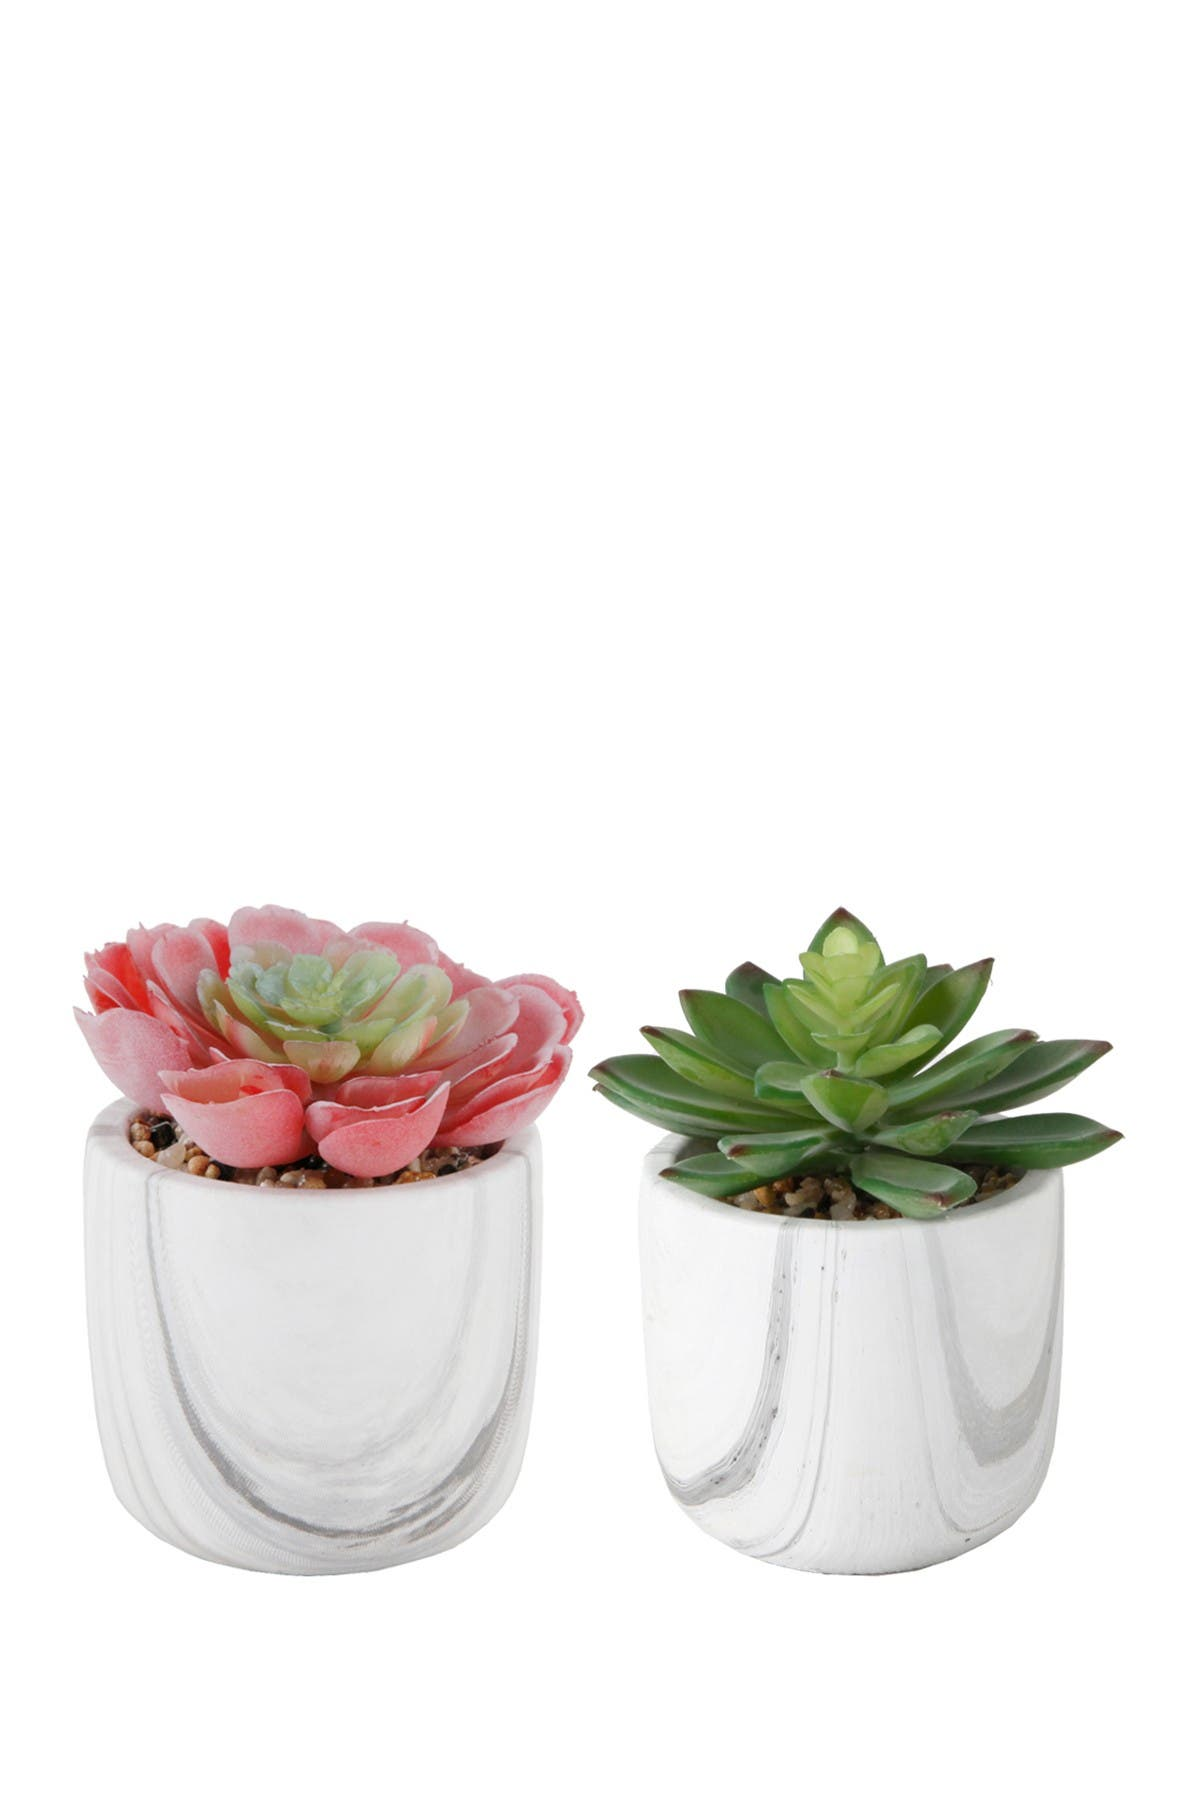 Image of FLORA BUNDA Small Succulent in Marble Planter- Set of 2